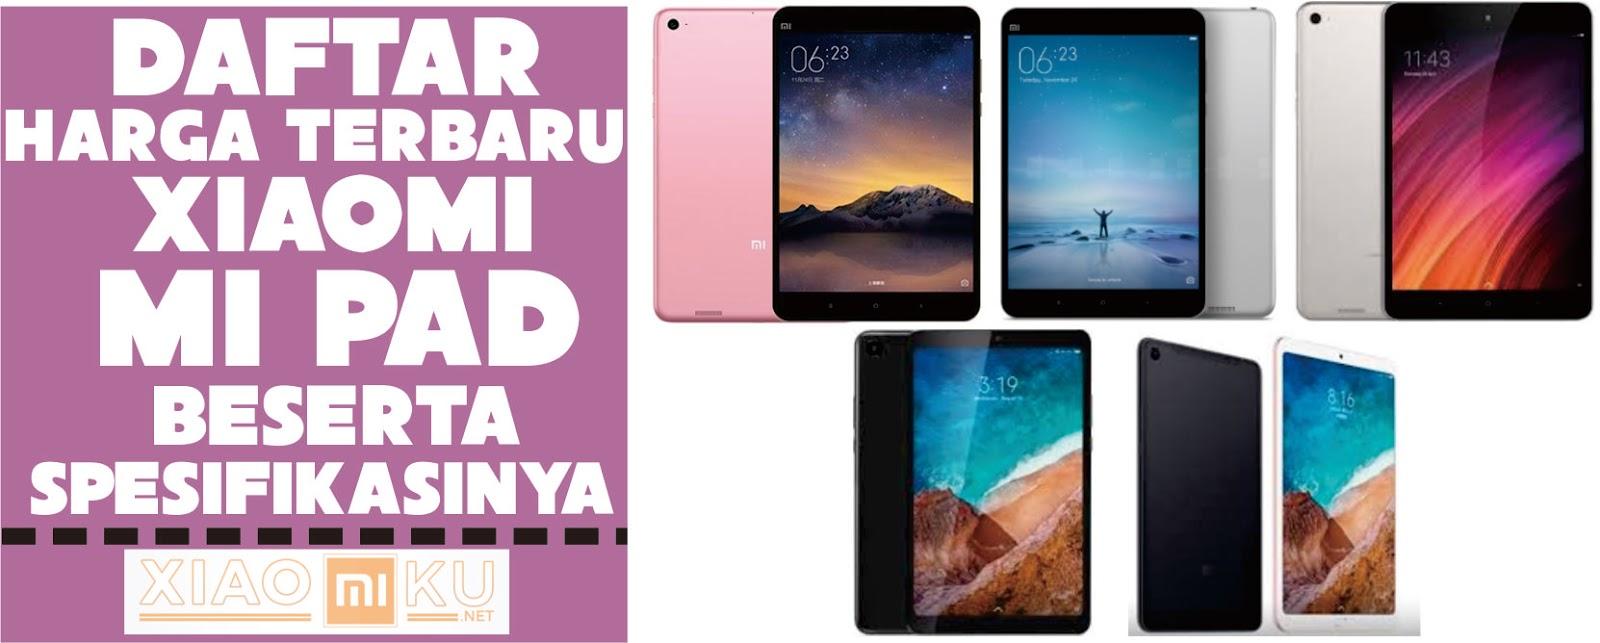 Daftar Harga Xiaomi Mi Pad Paling Lengkap